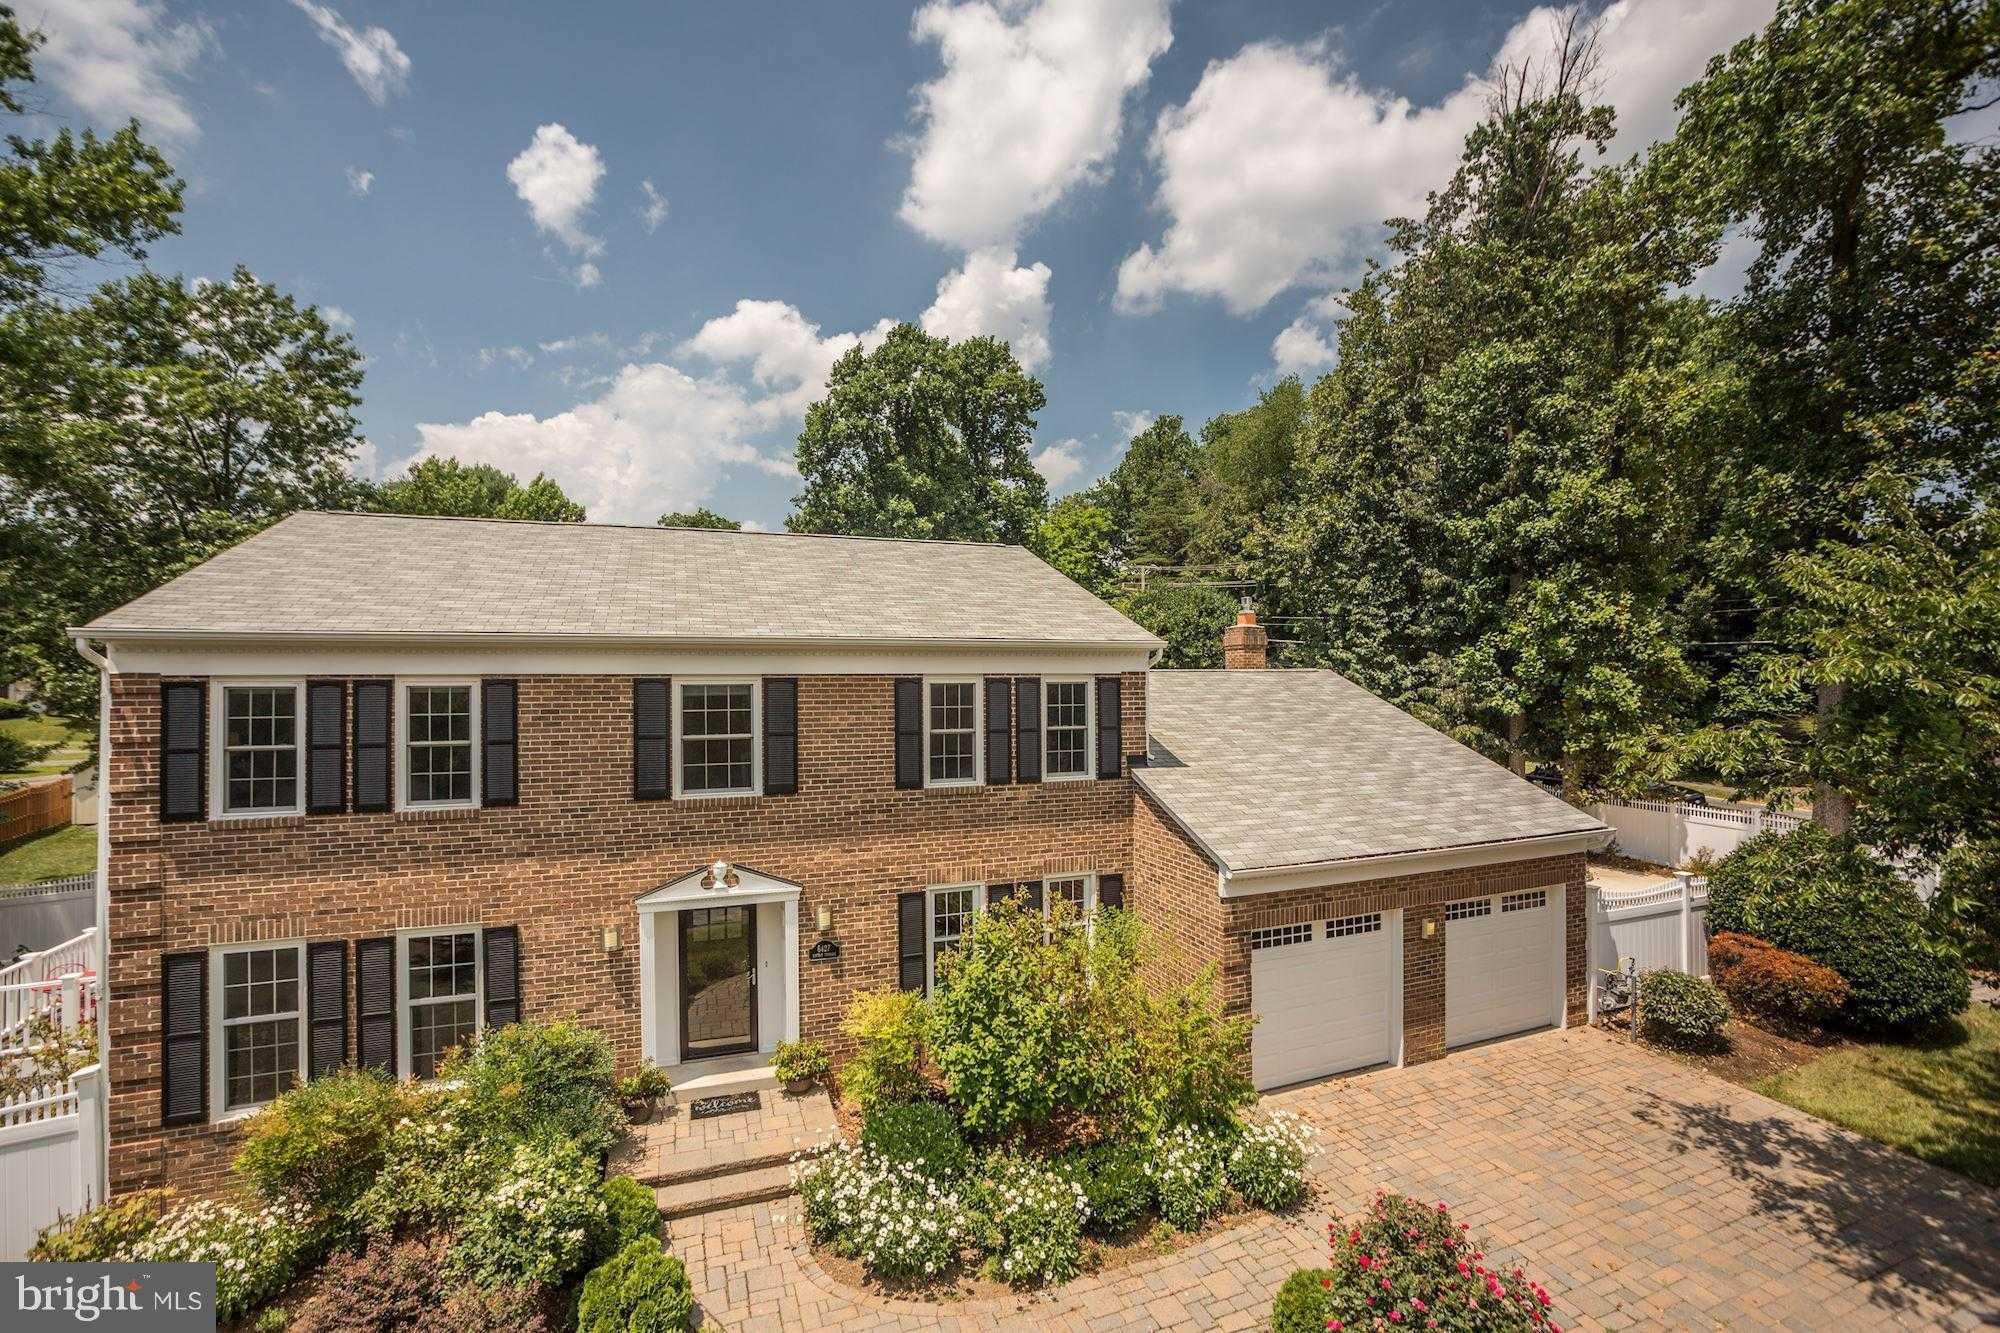 Homes for Sale in McLean - John Mentis, Realtor